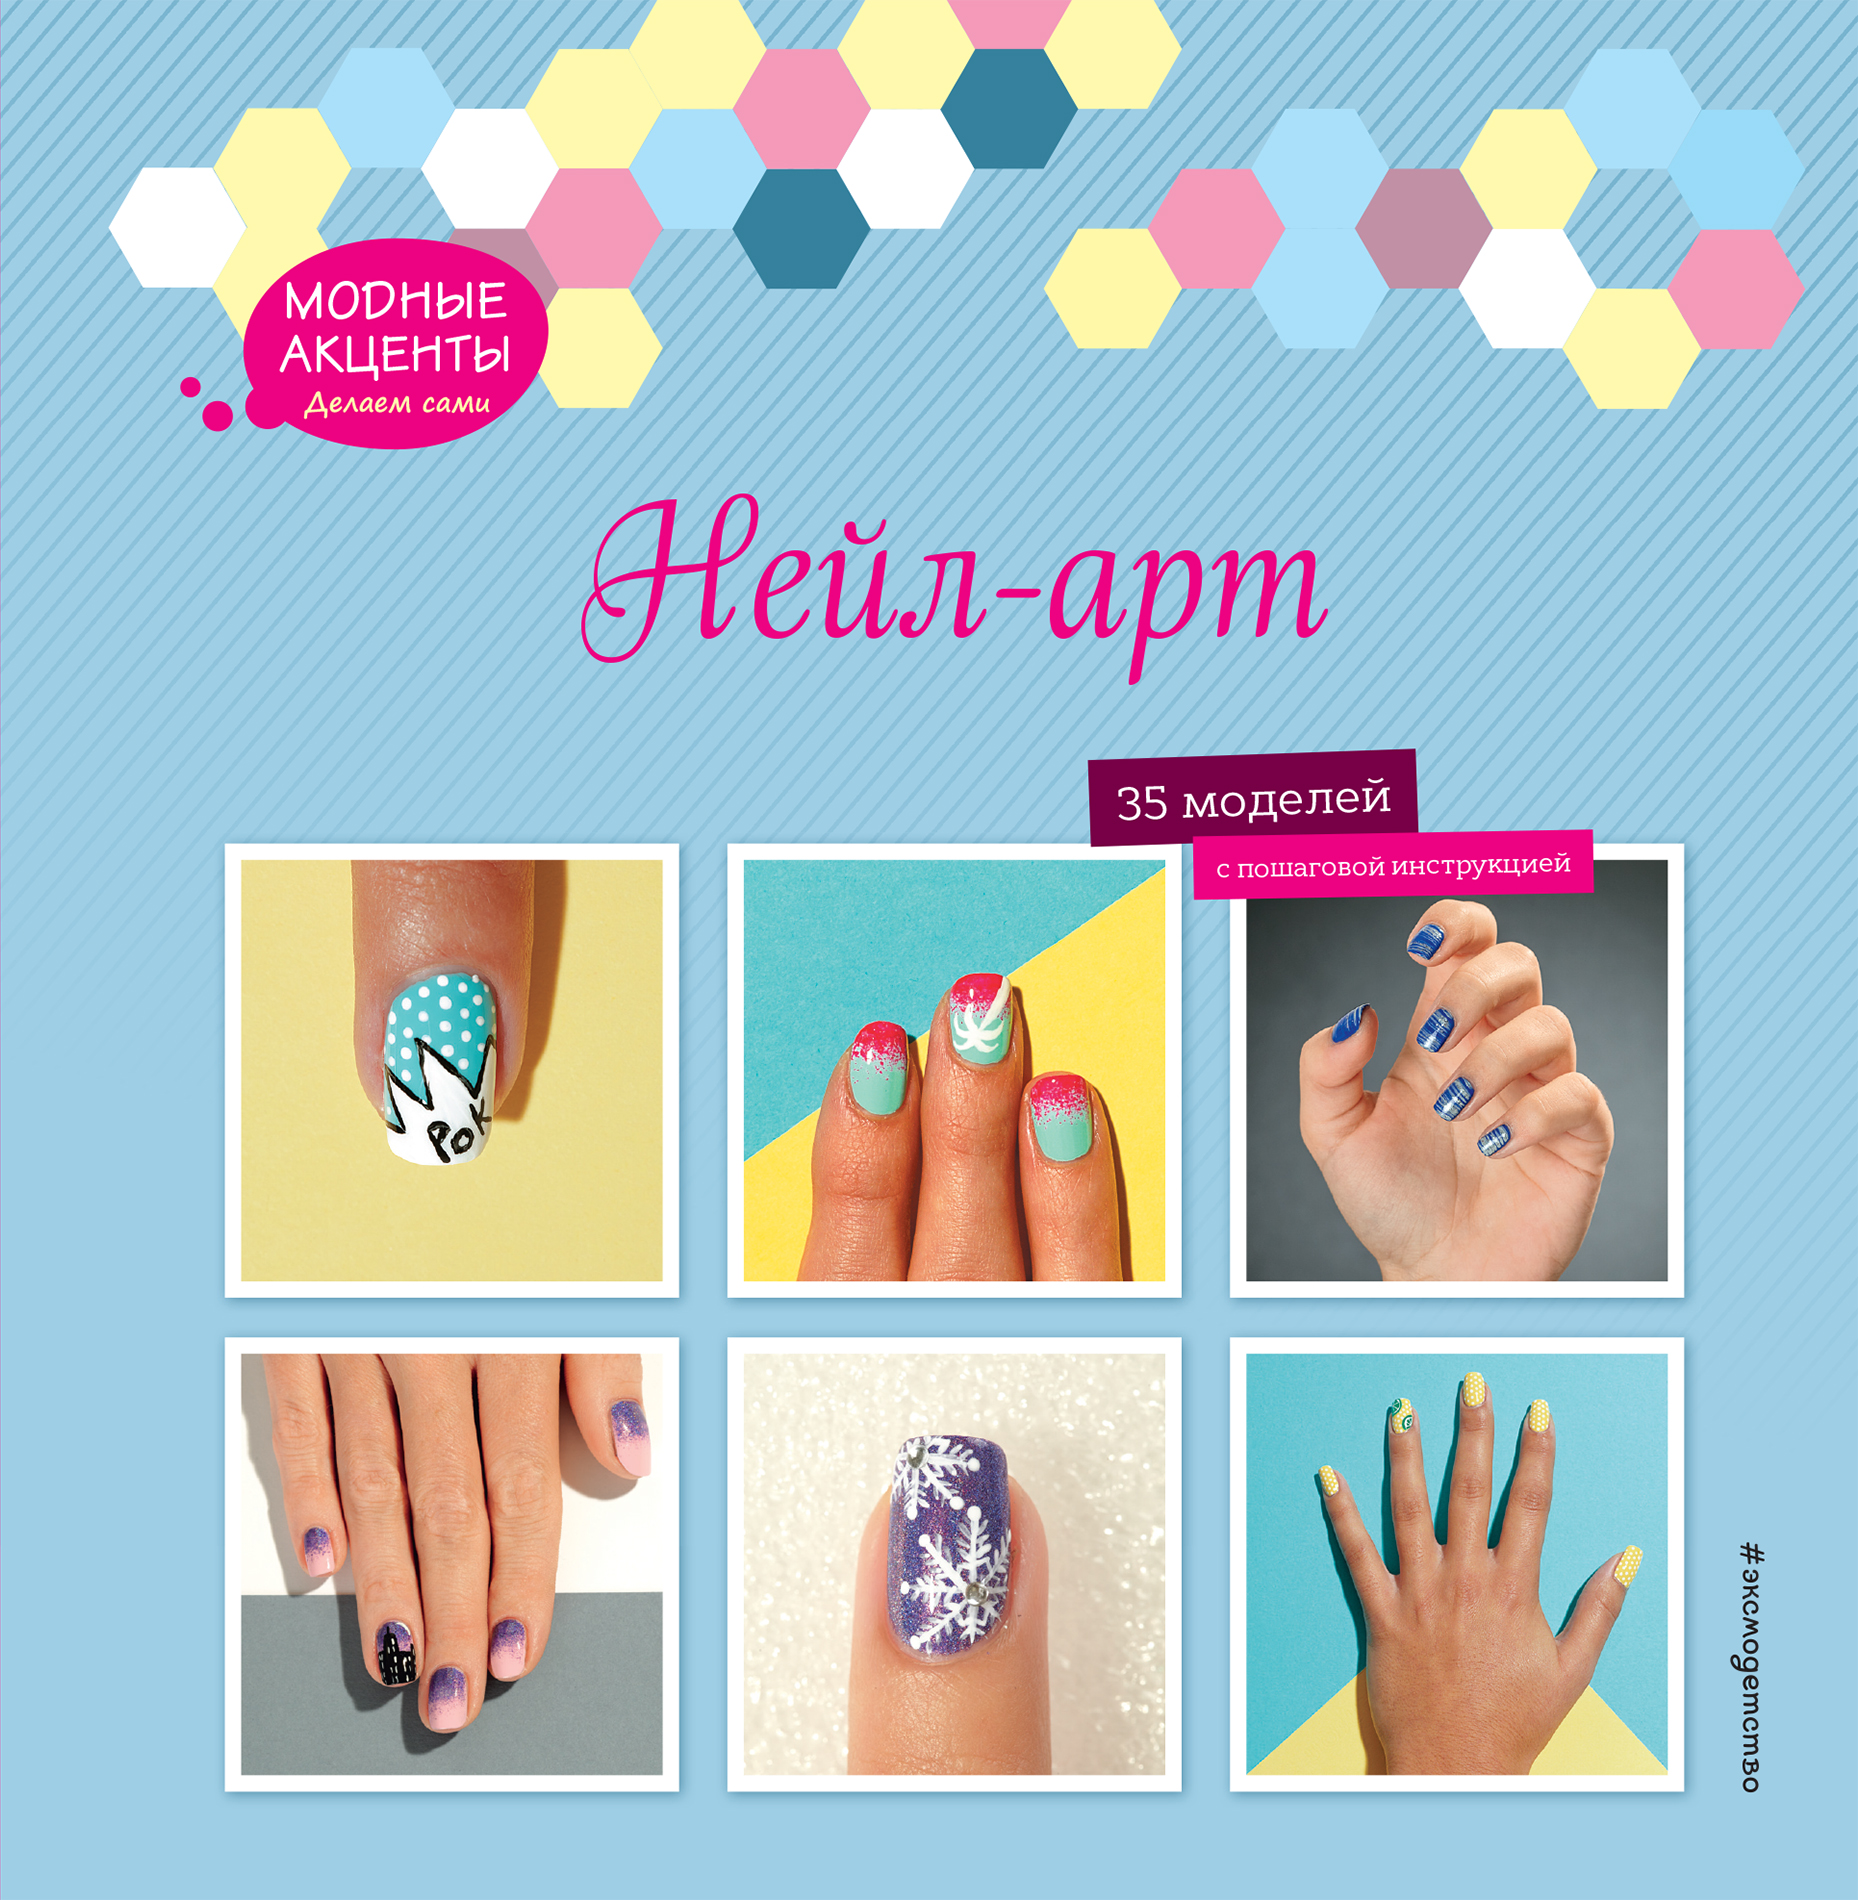 Нейл-арт книга моделирование ногтей зеленова г с